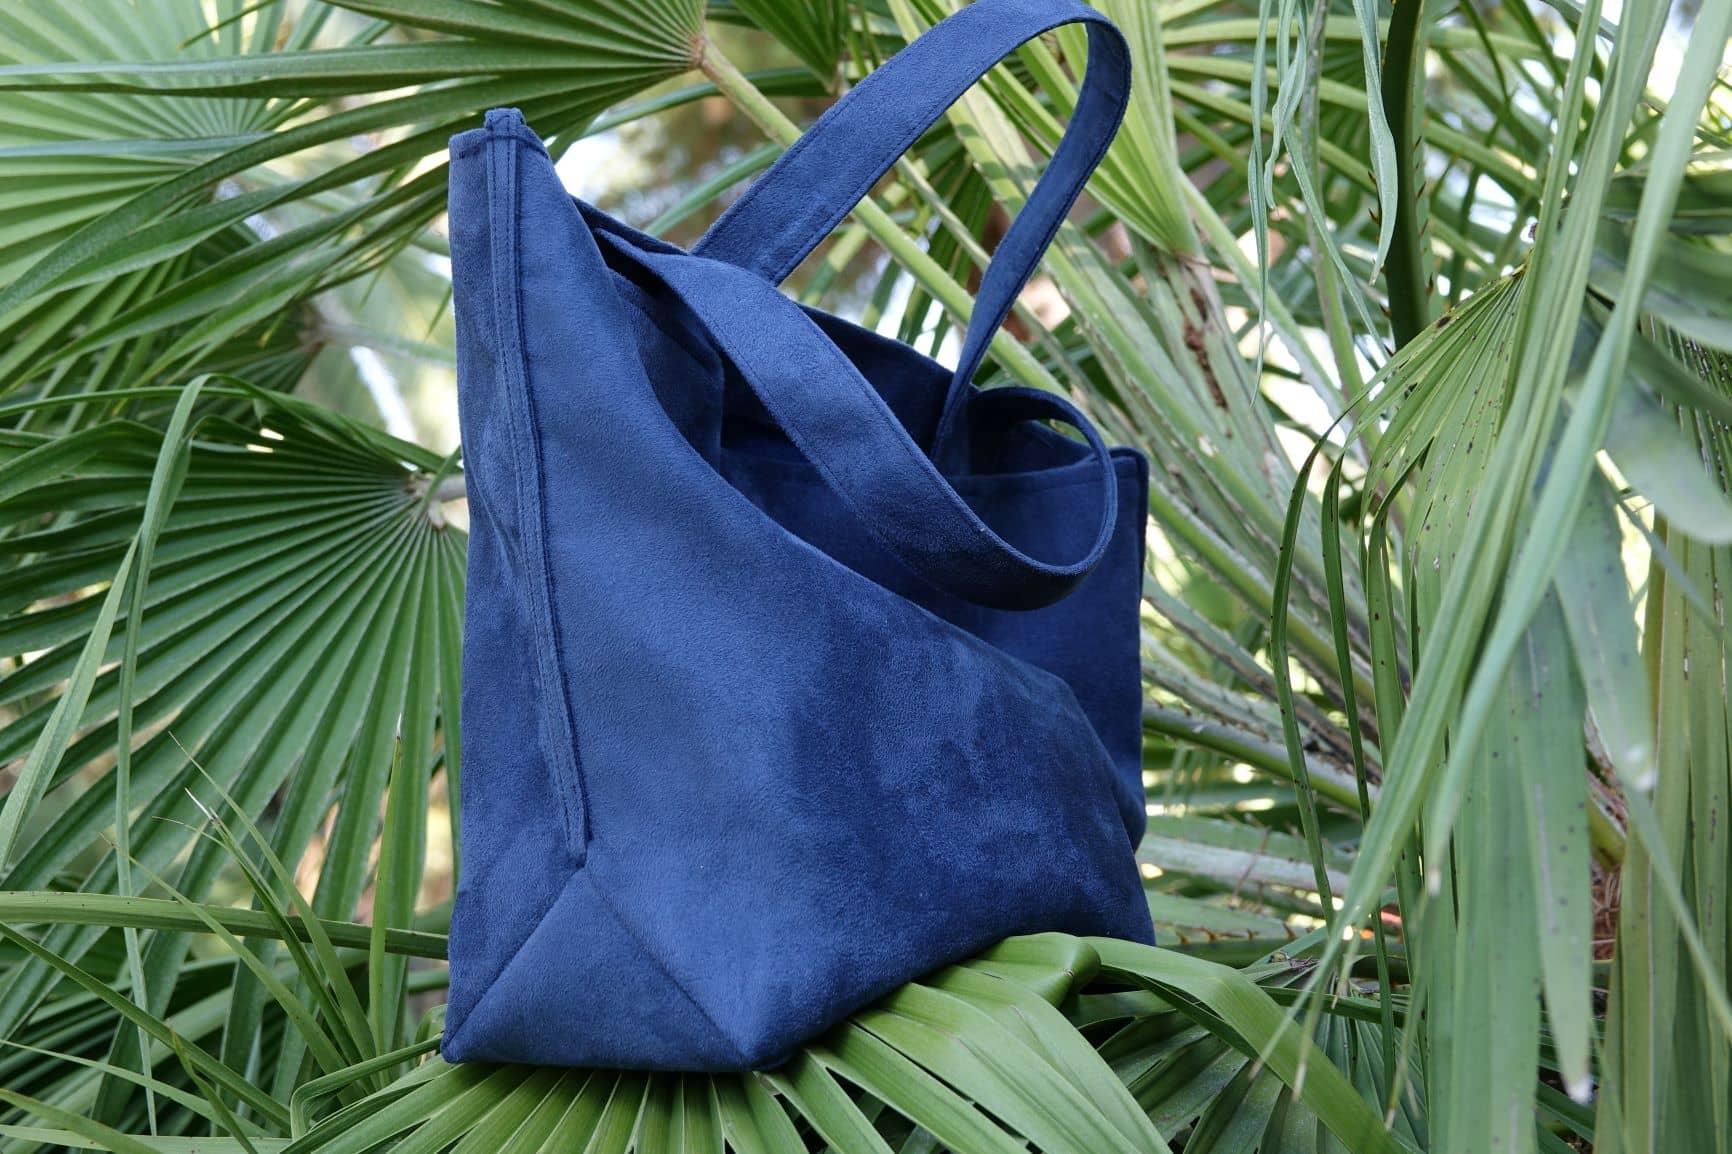 sac cabas suedine bleu marine aloee